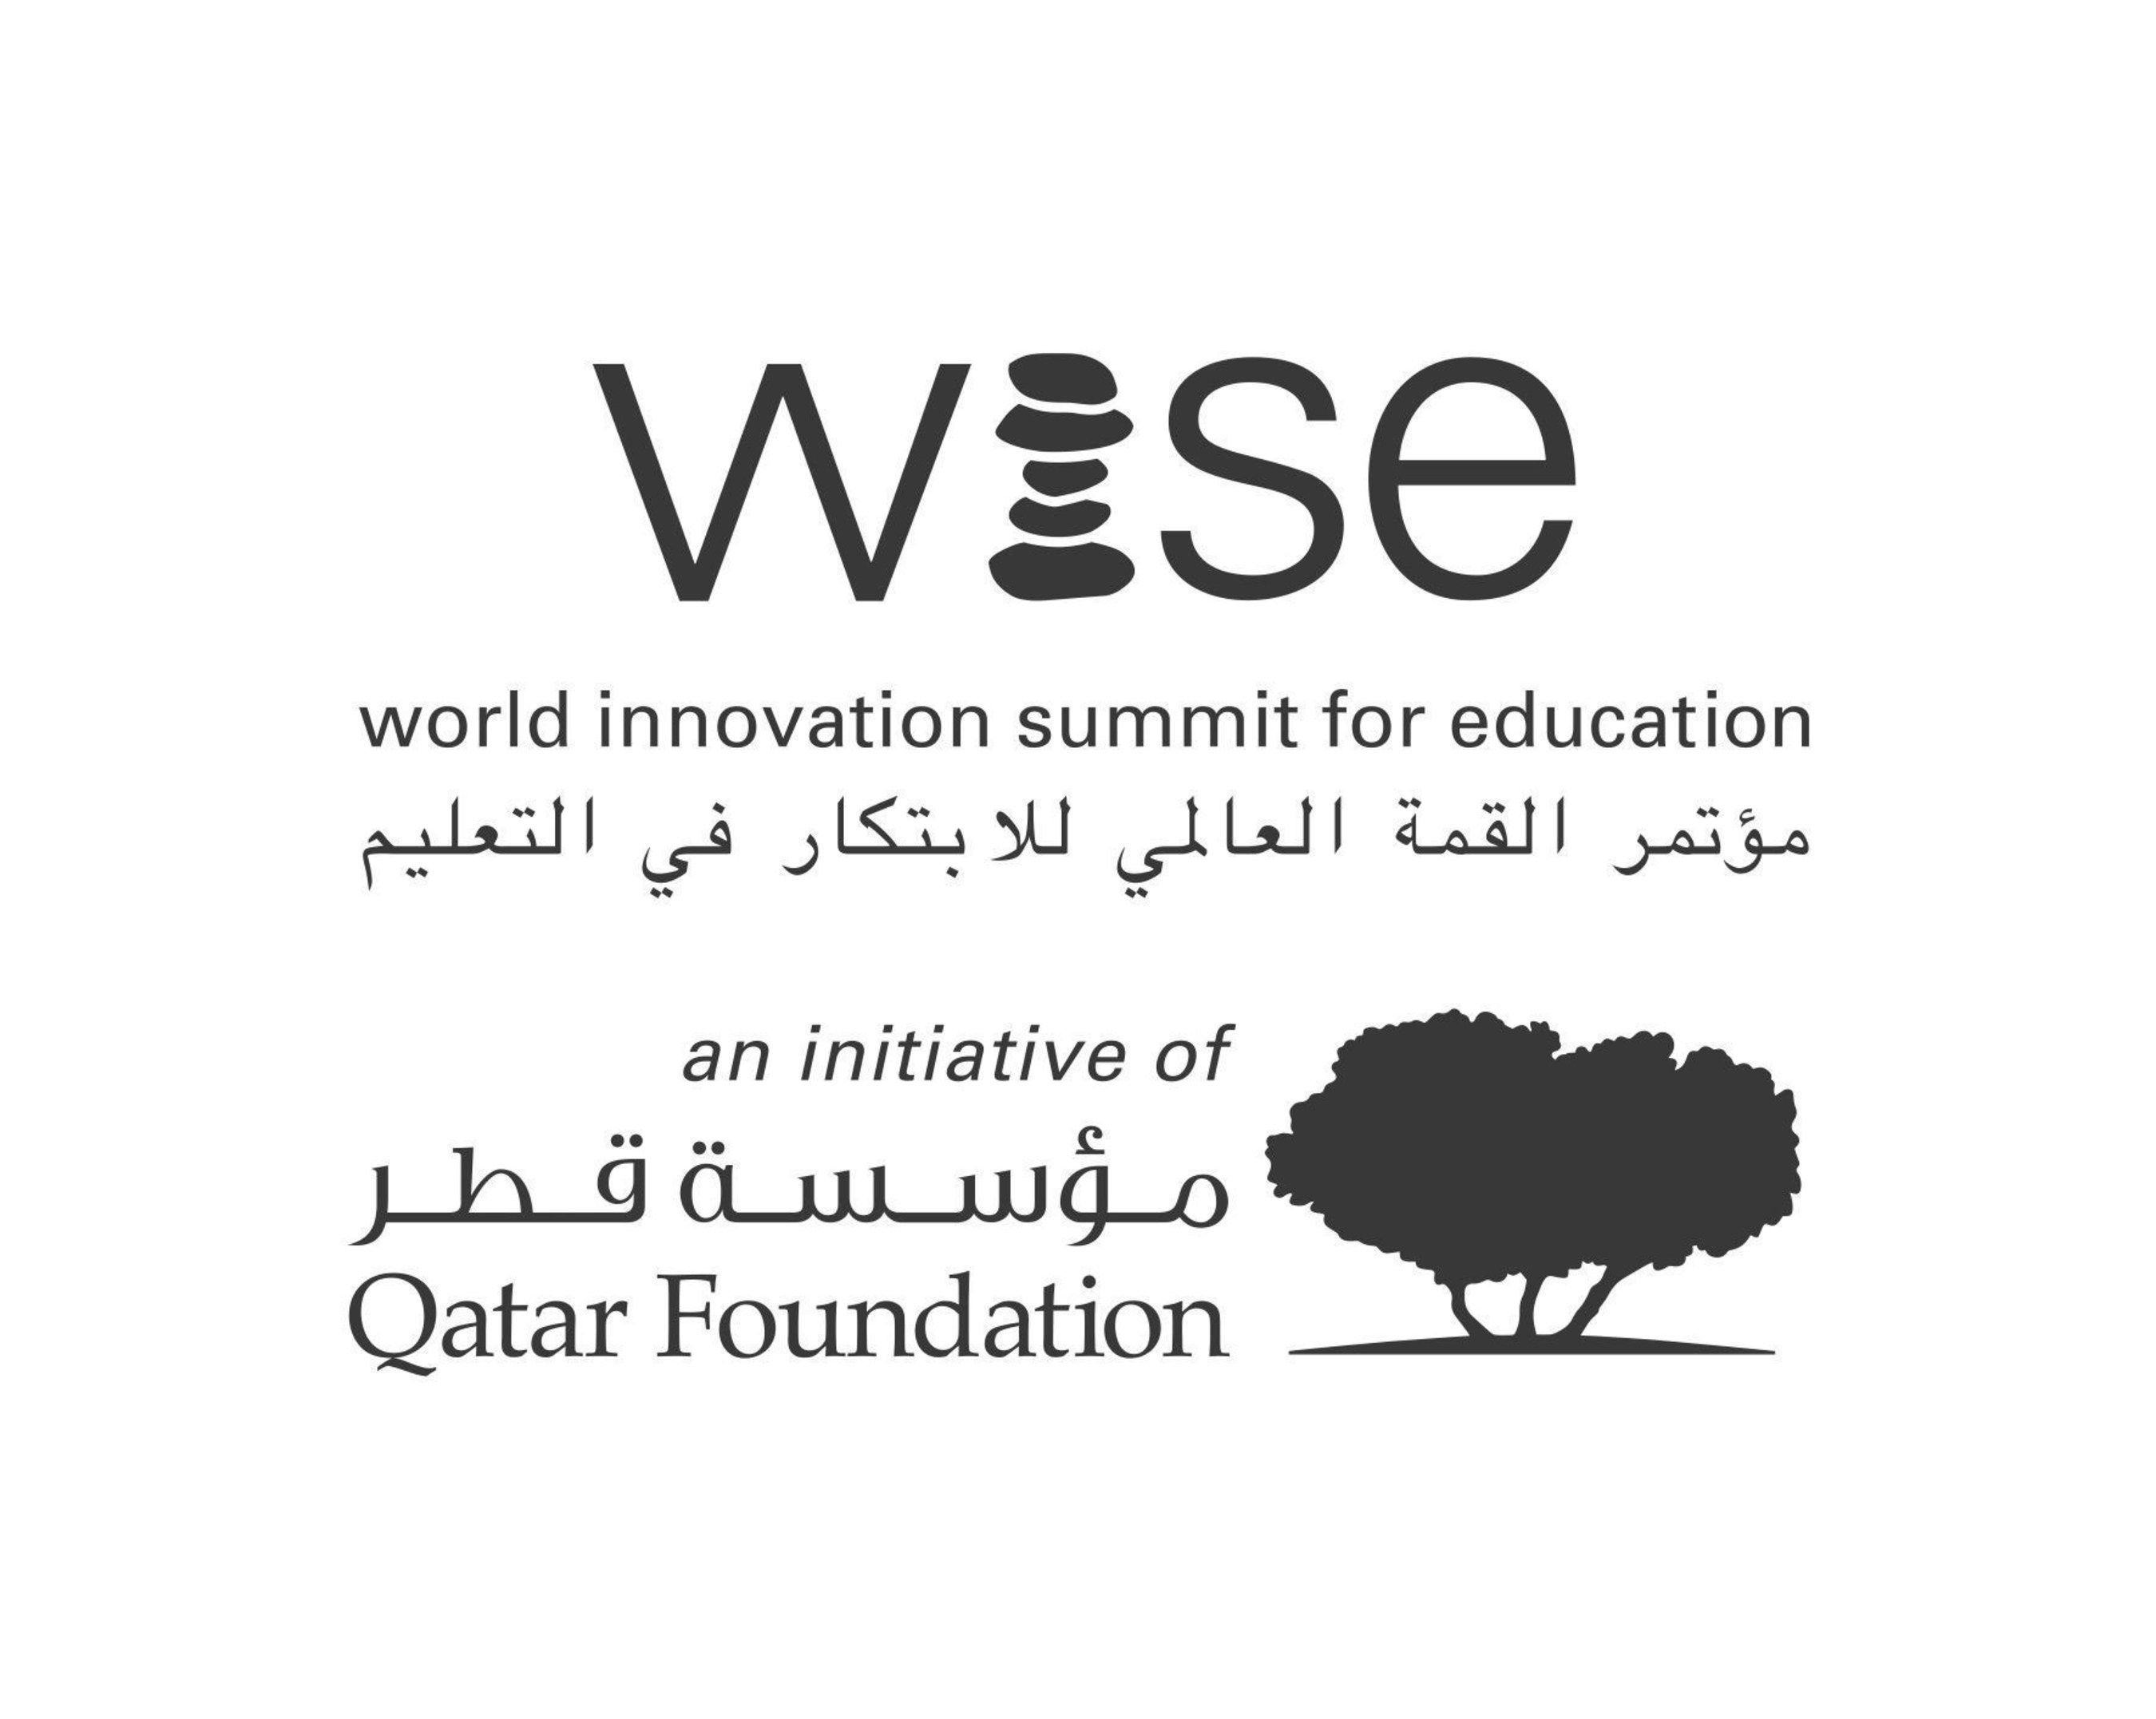 WISE World Innovation Summit for Education (PRNewsFoto/WISE)